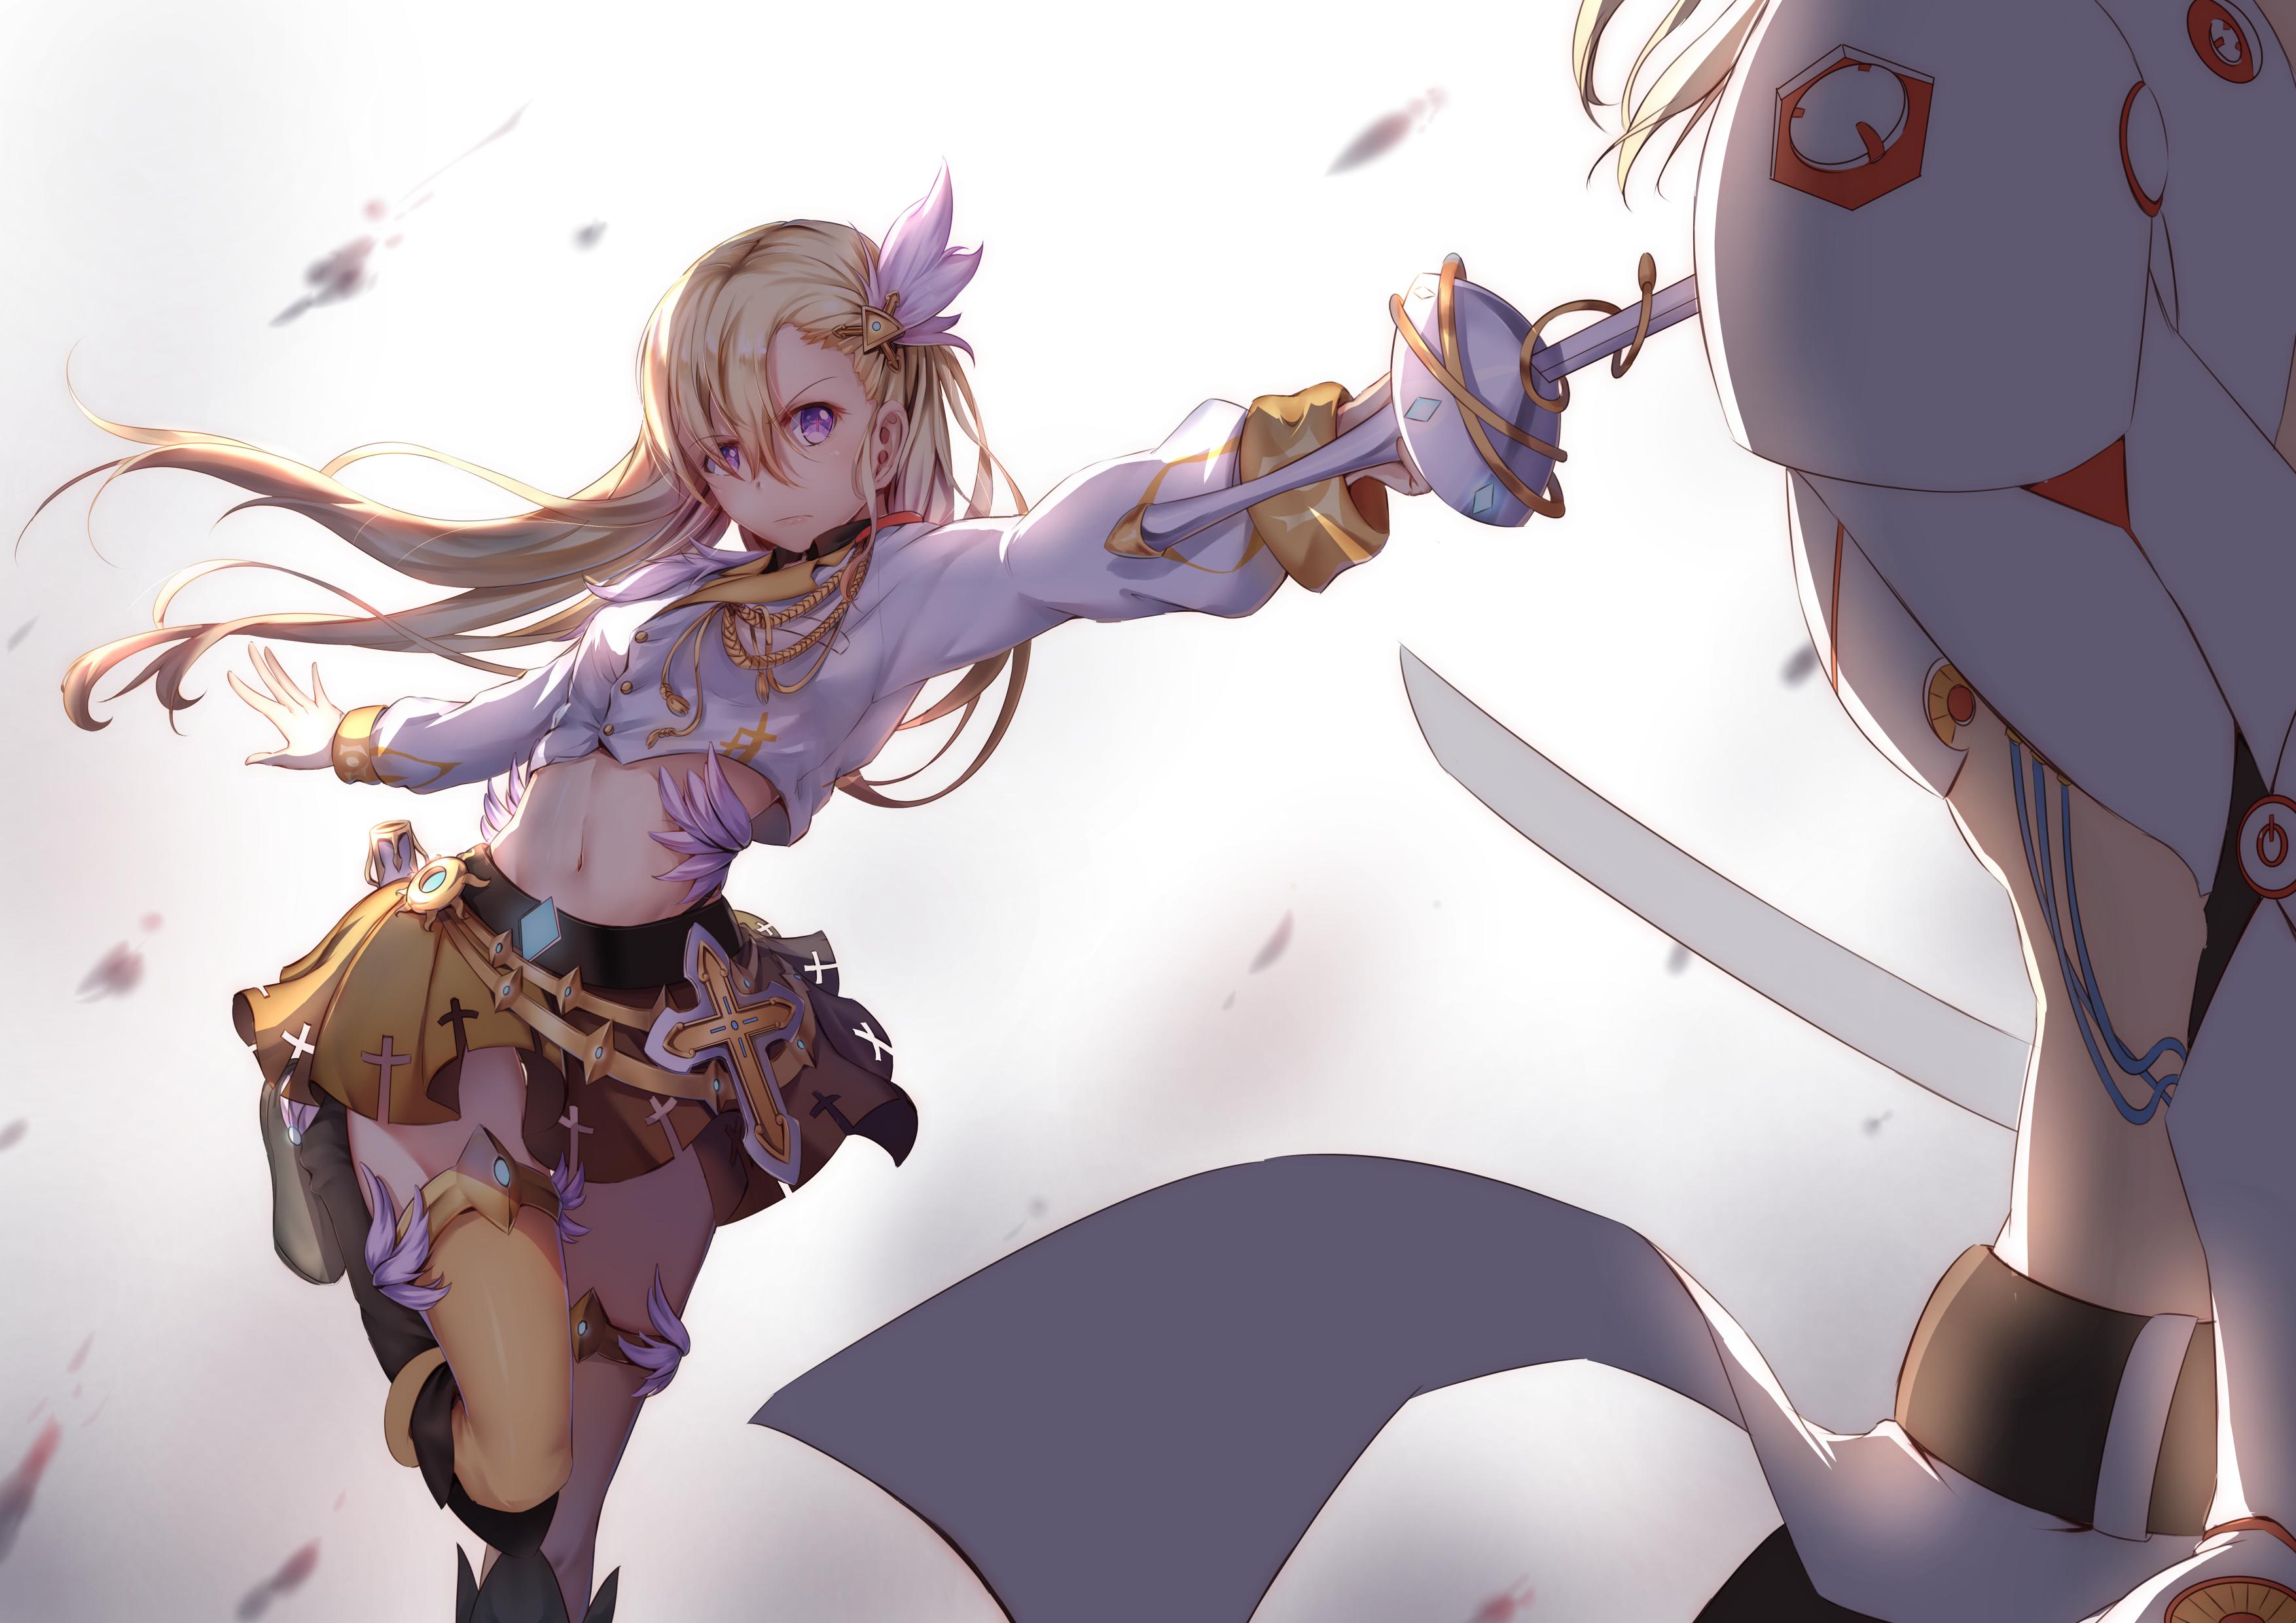 Cute Animated Wallpapers For Mobile Anime Girl Sword Long Hair 4k Hd Anime 4k Wallpapers